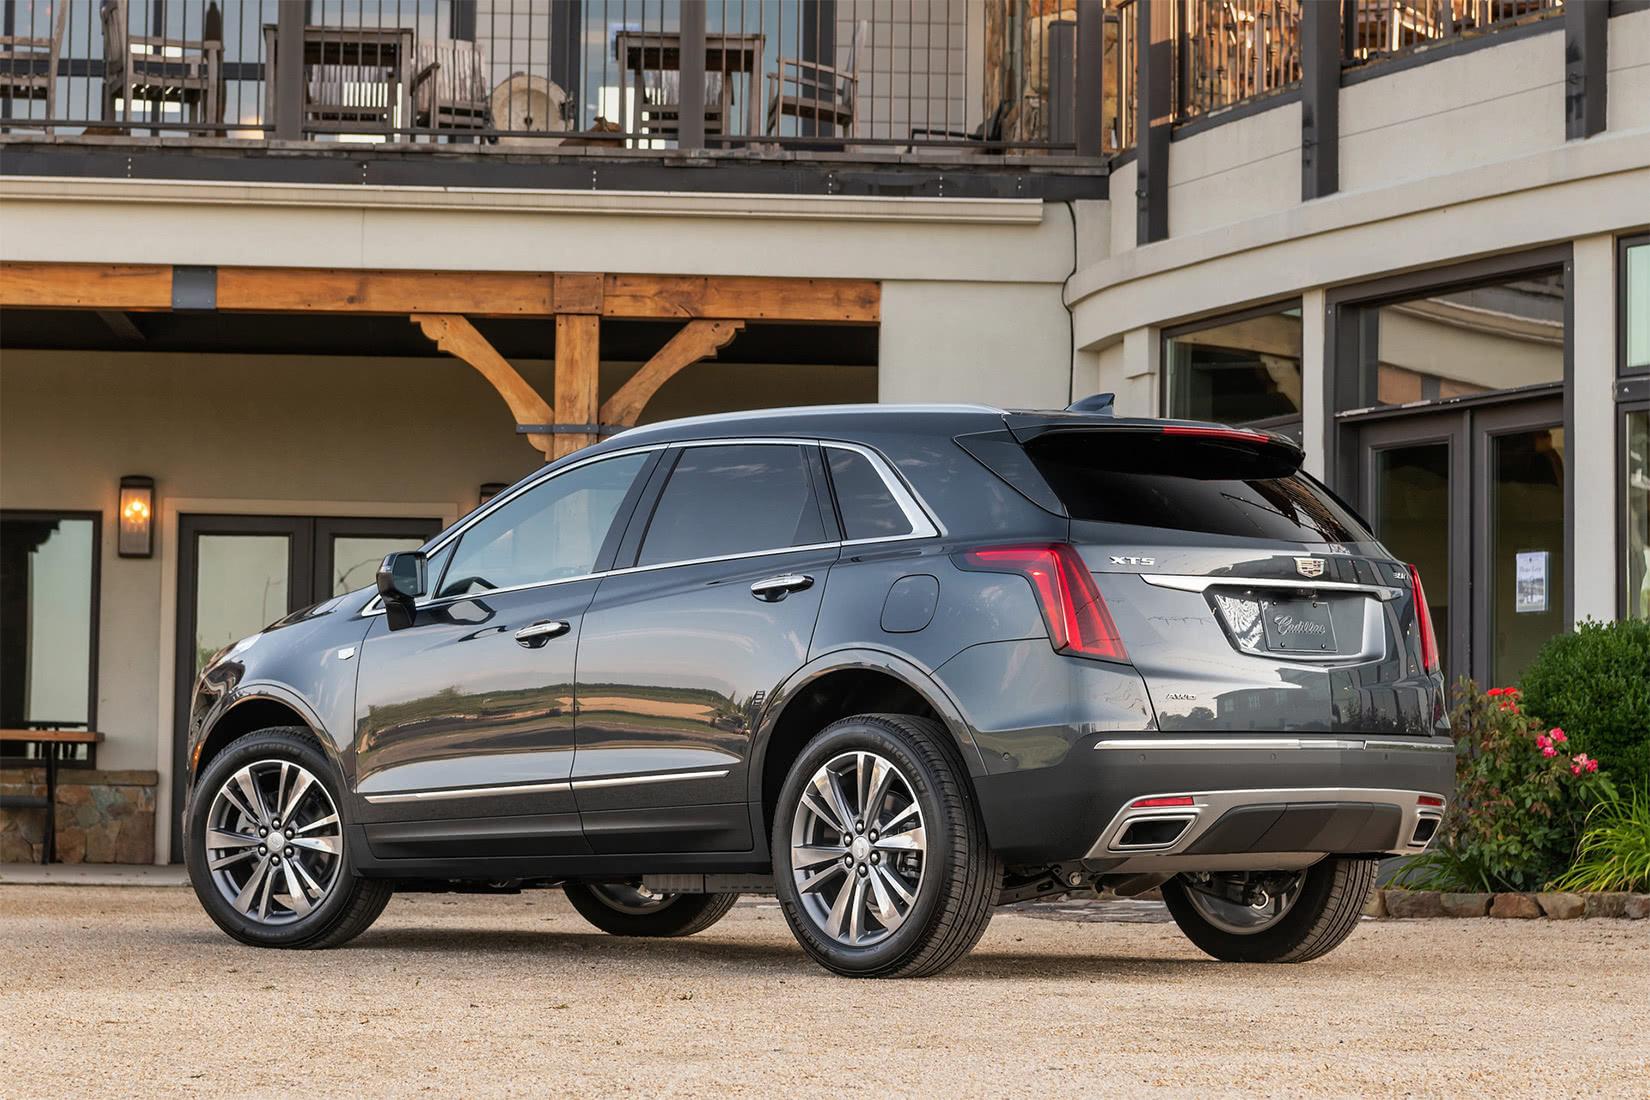 best luxury car brand Cadillac - Luxe Digital